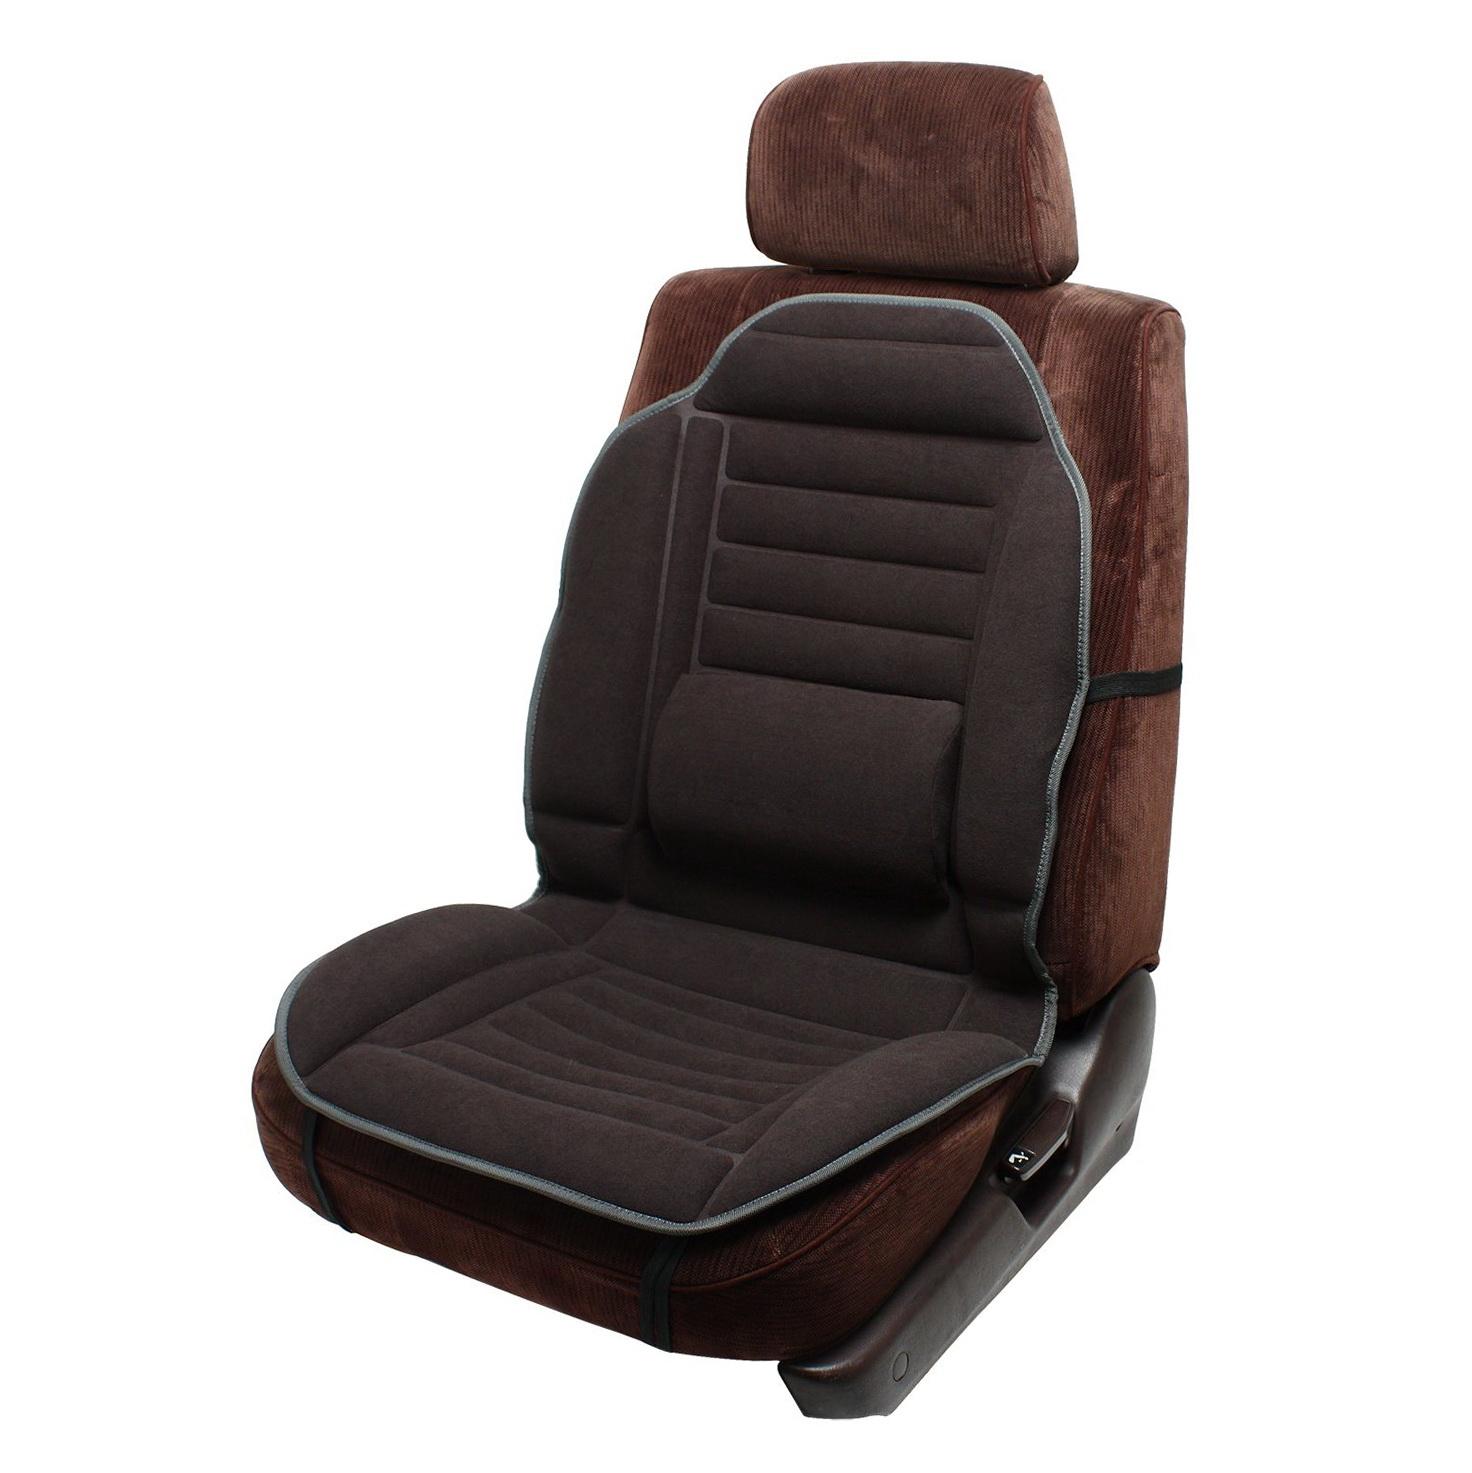 Foam Seat Cushions For Cars